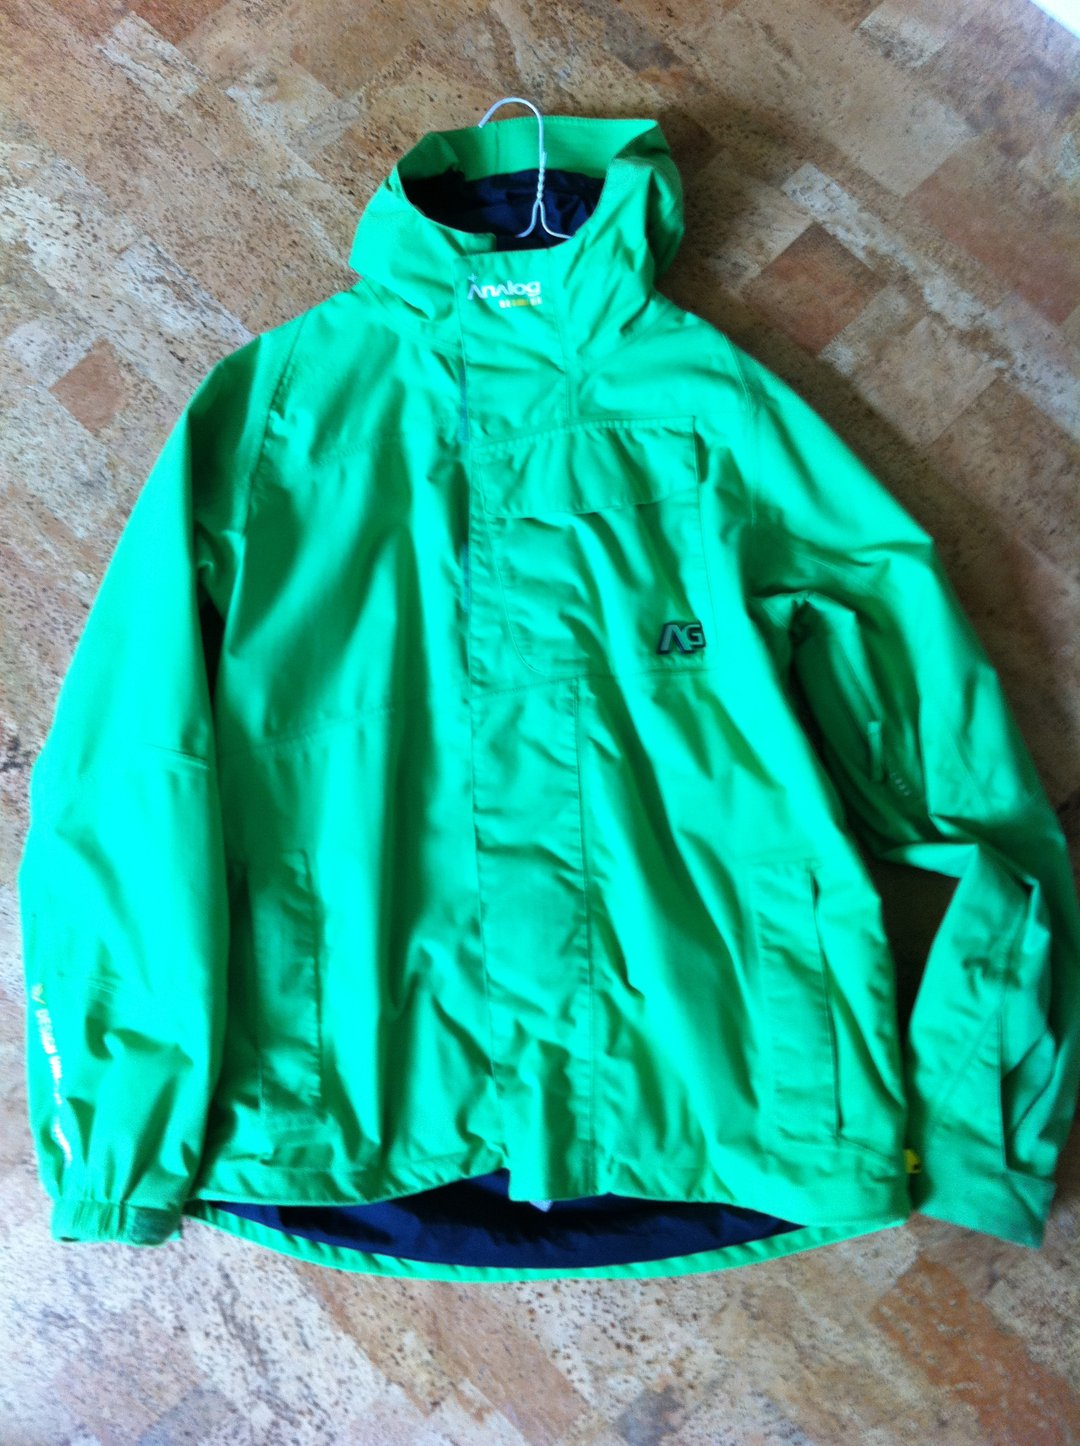 Analog green jacket